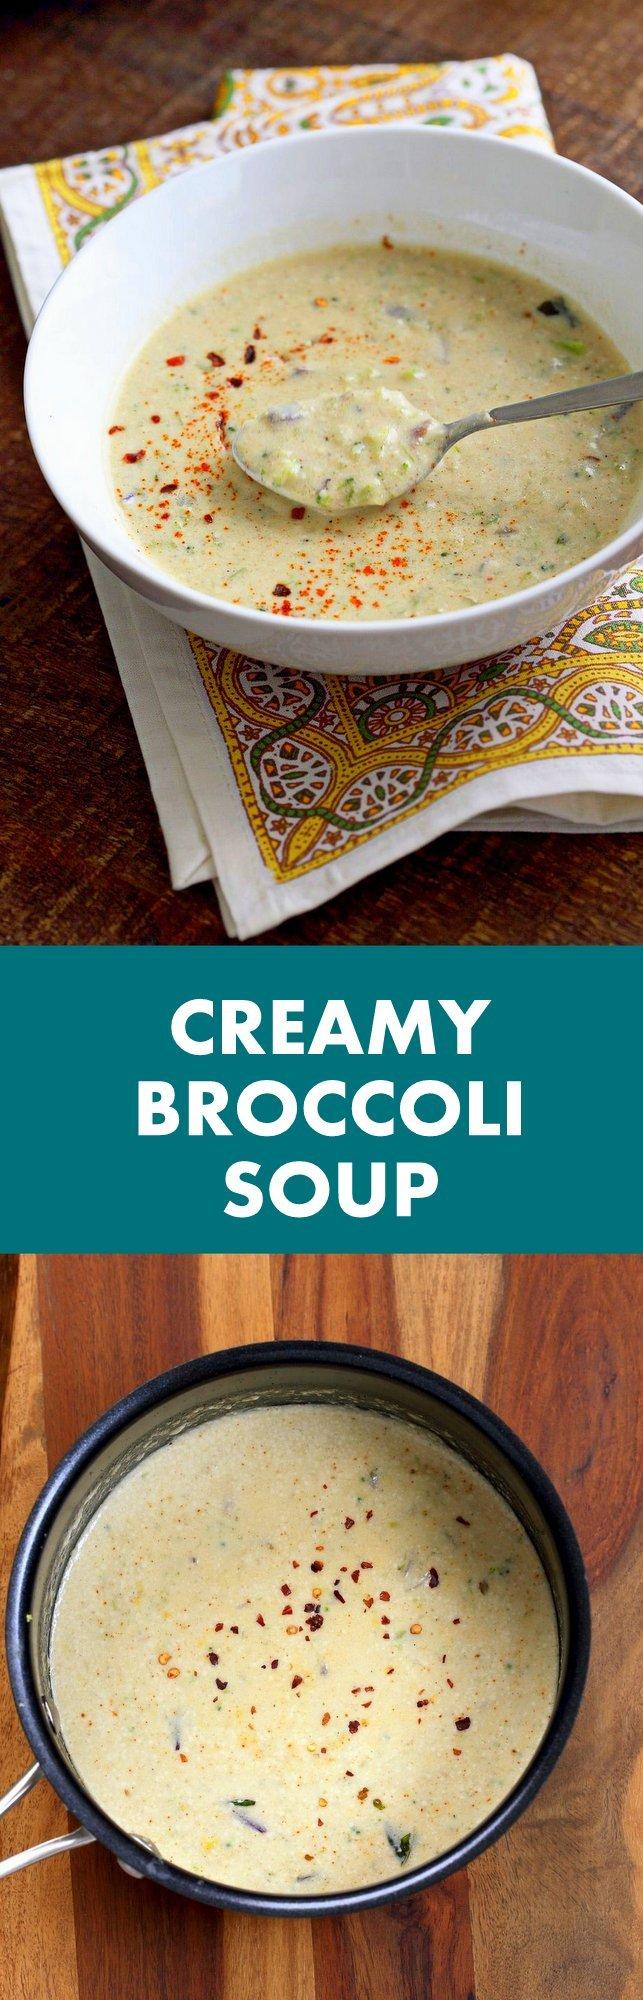 Easy Creamy Vegan Broccoli Soup. Shredded broccoli with spices, basil and a creamy cashew sauce. Chunky Cream of Broccoli Soup. Vegan Glutenfree Soyfree Recipe   VeganRicha.com